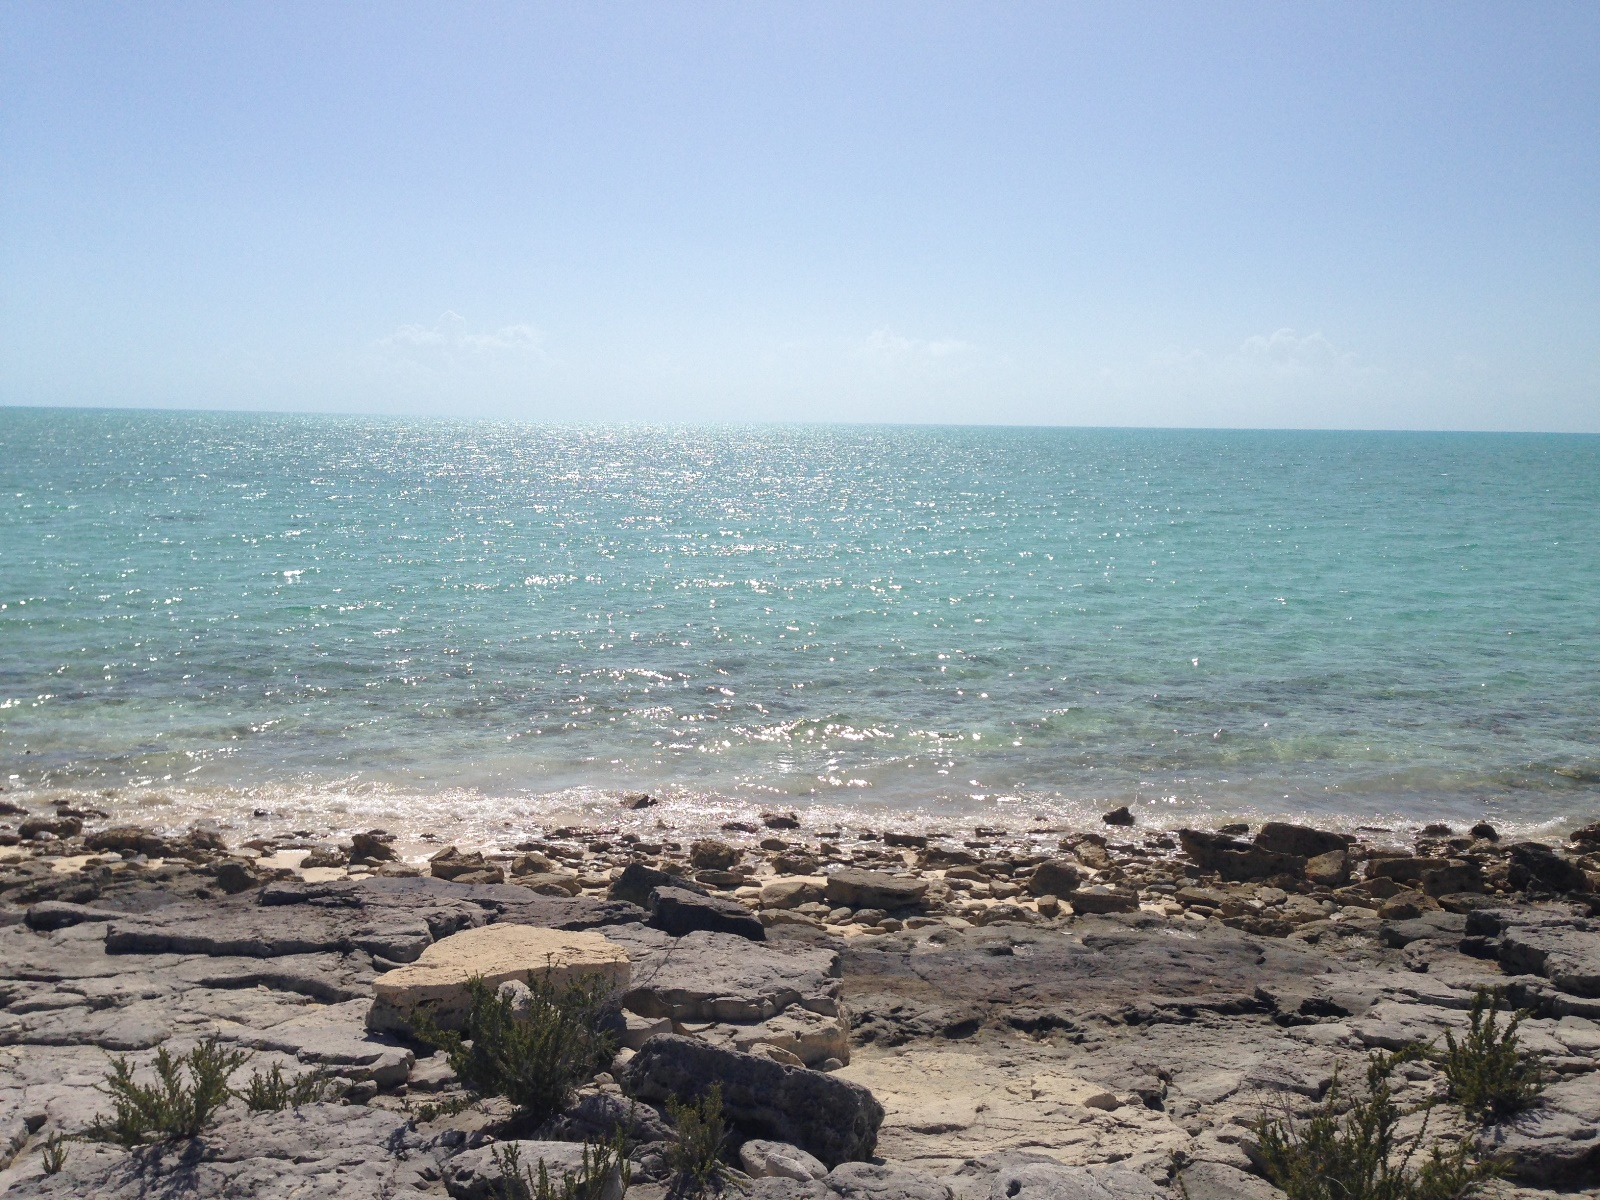 Land for Sale at Waterfront Lot on the South Side of Little Exuma Bahama Island Beach, Exuma, Bahamas